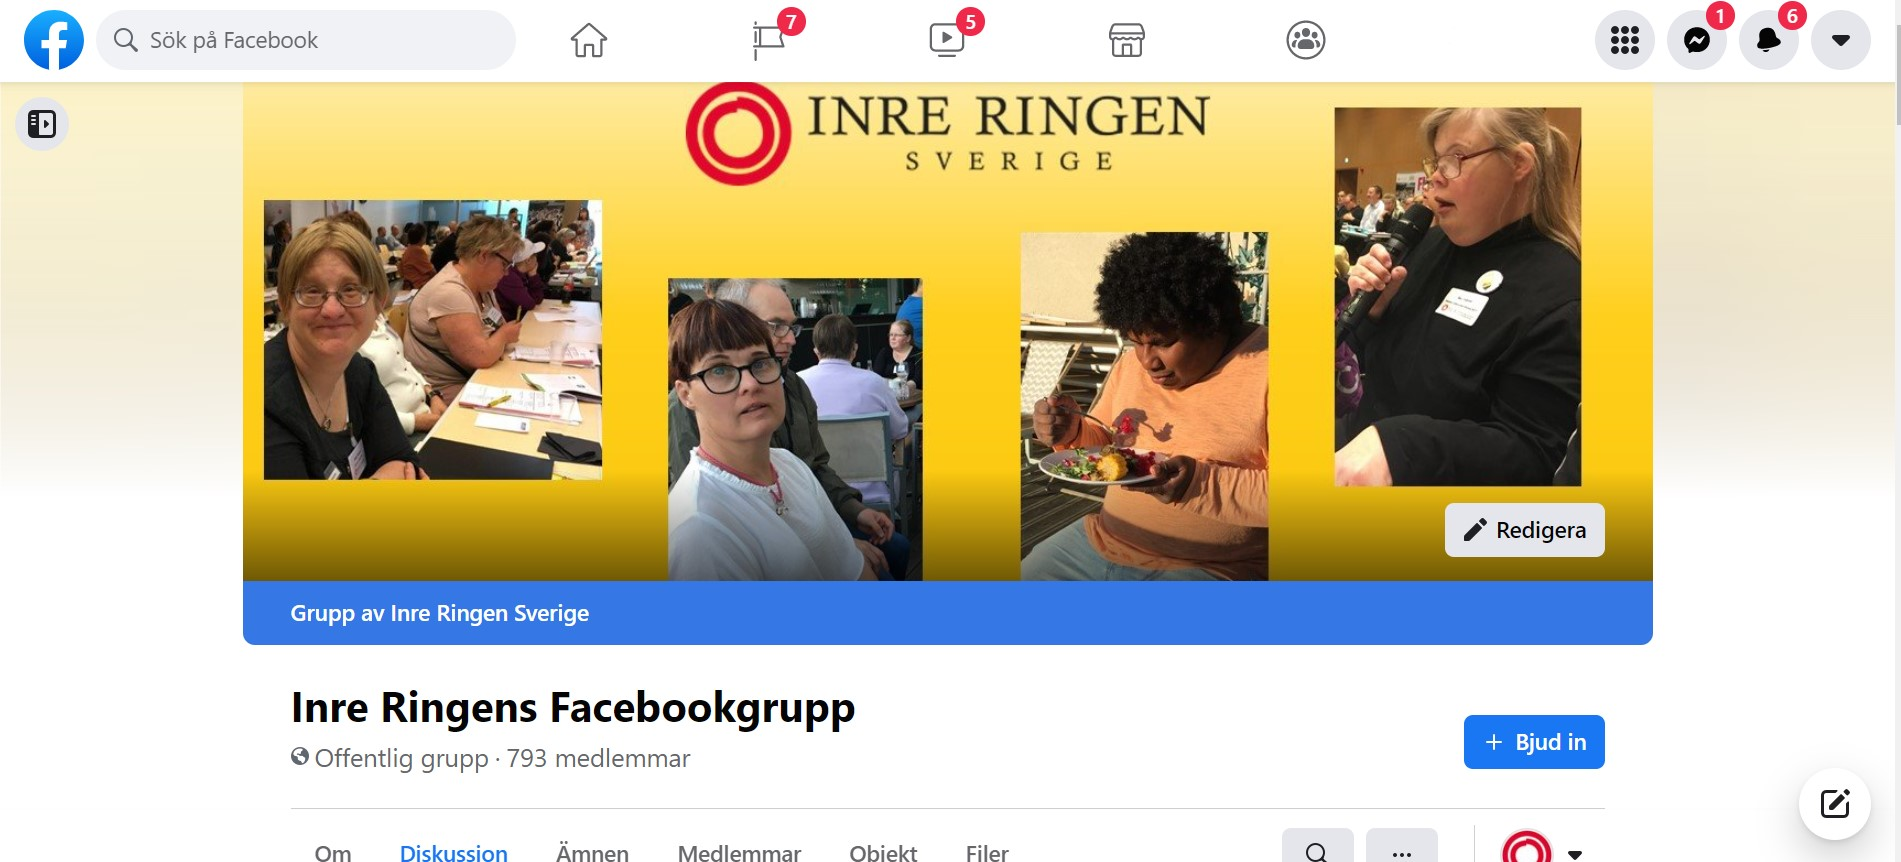 Omslagsfoto från Inre Ringens Facebookgrupp